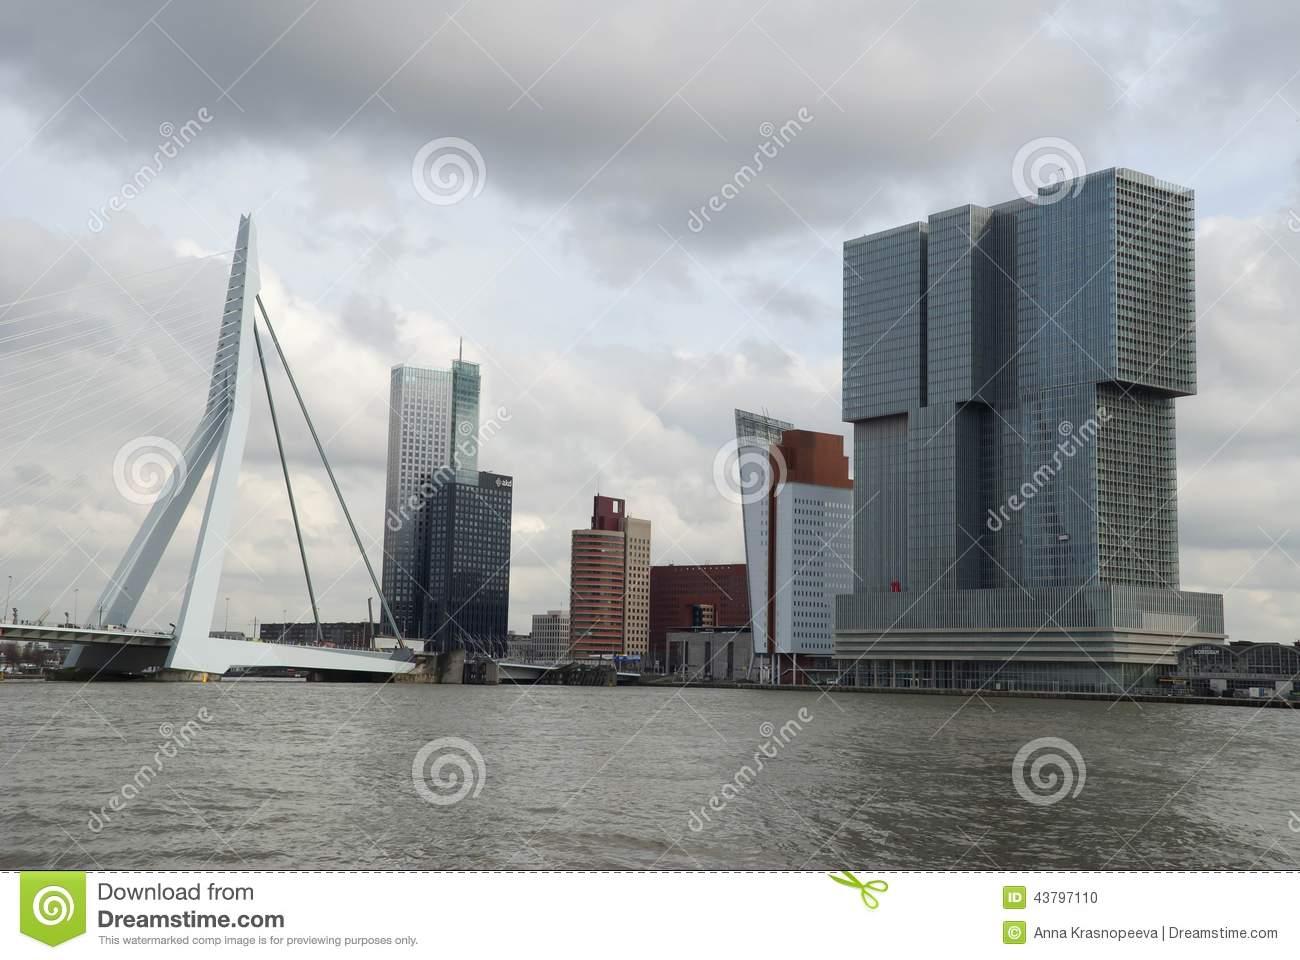 De Rotterdam Building And The Erasmus Bridge, The Netherlands.